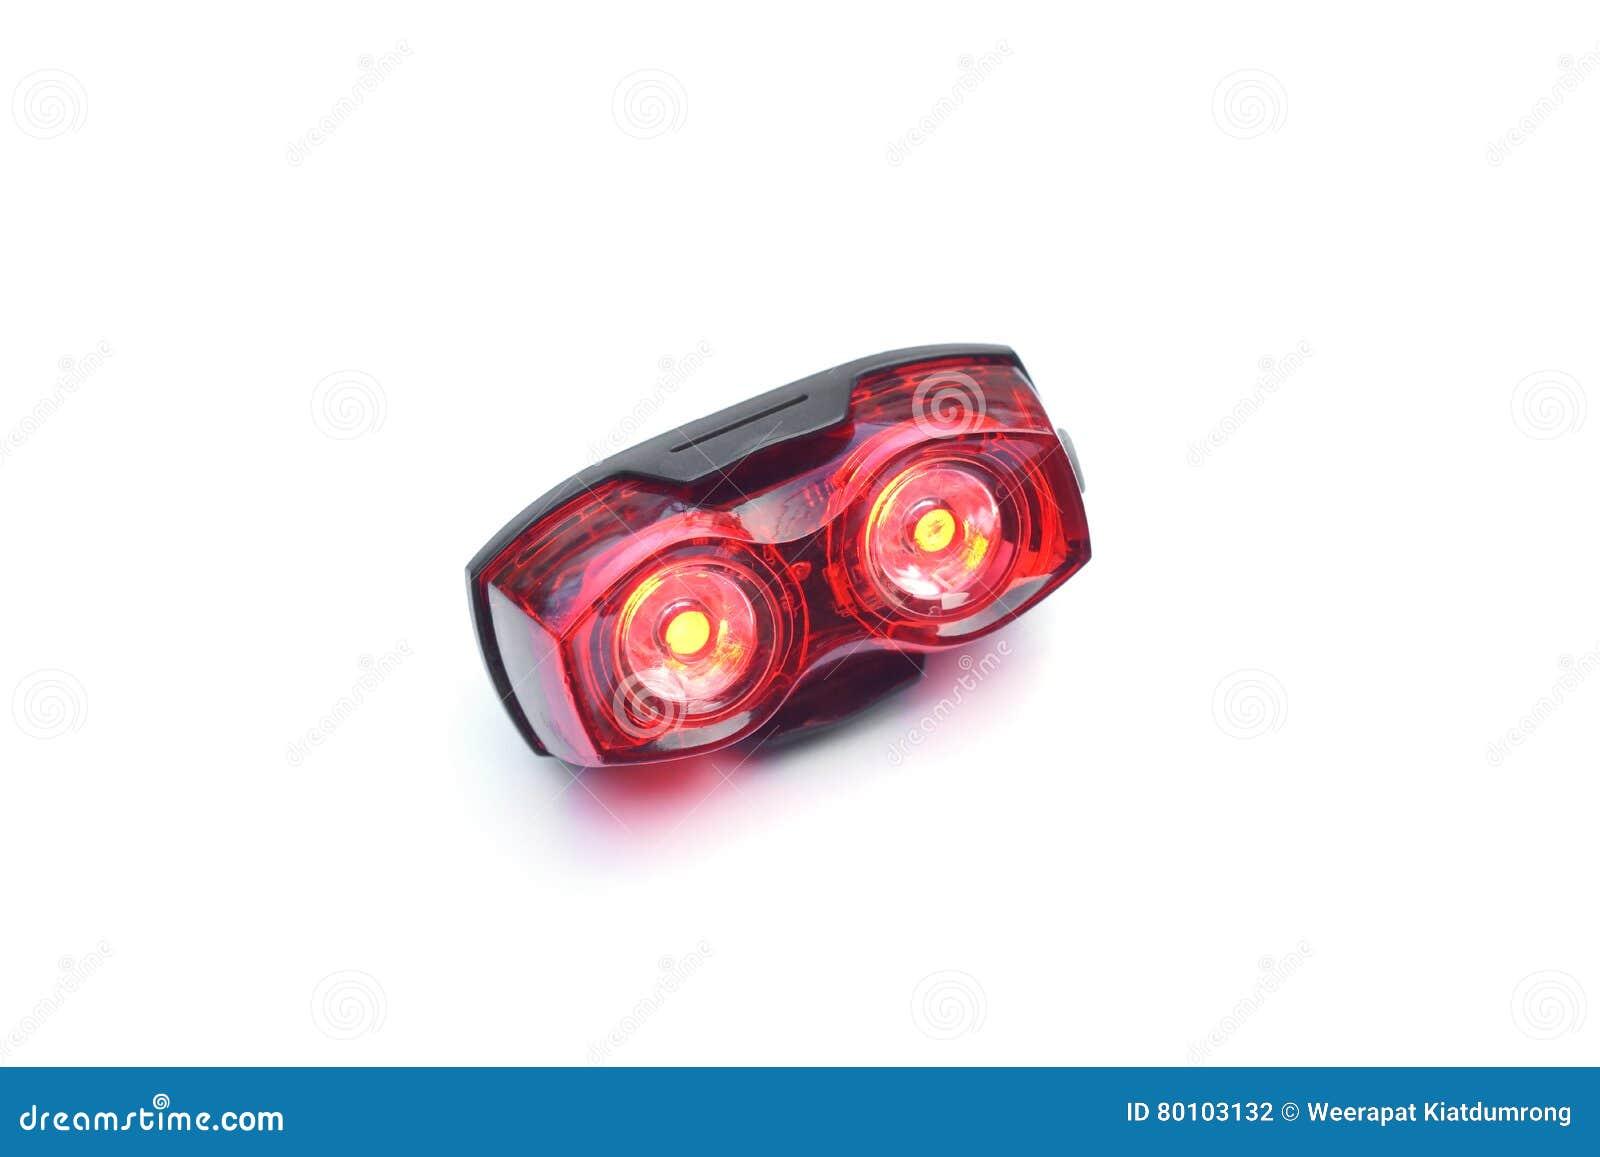 Fiets achter lichte reflector